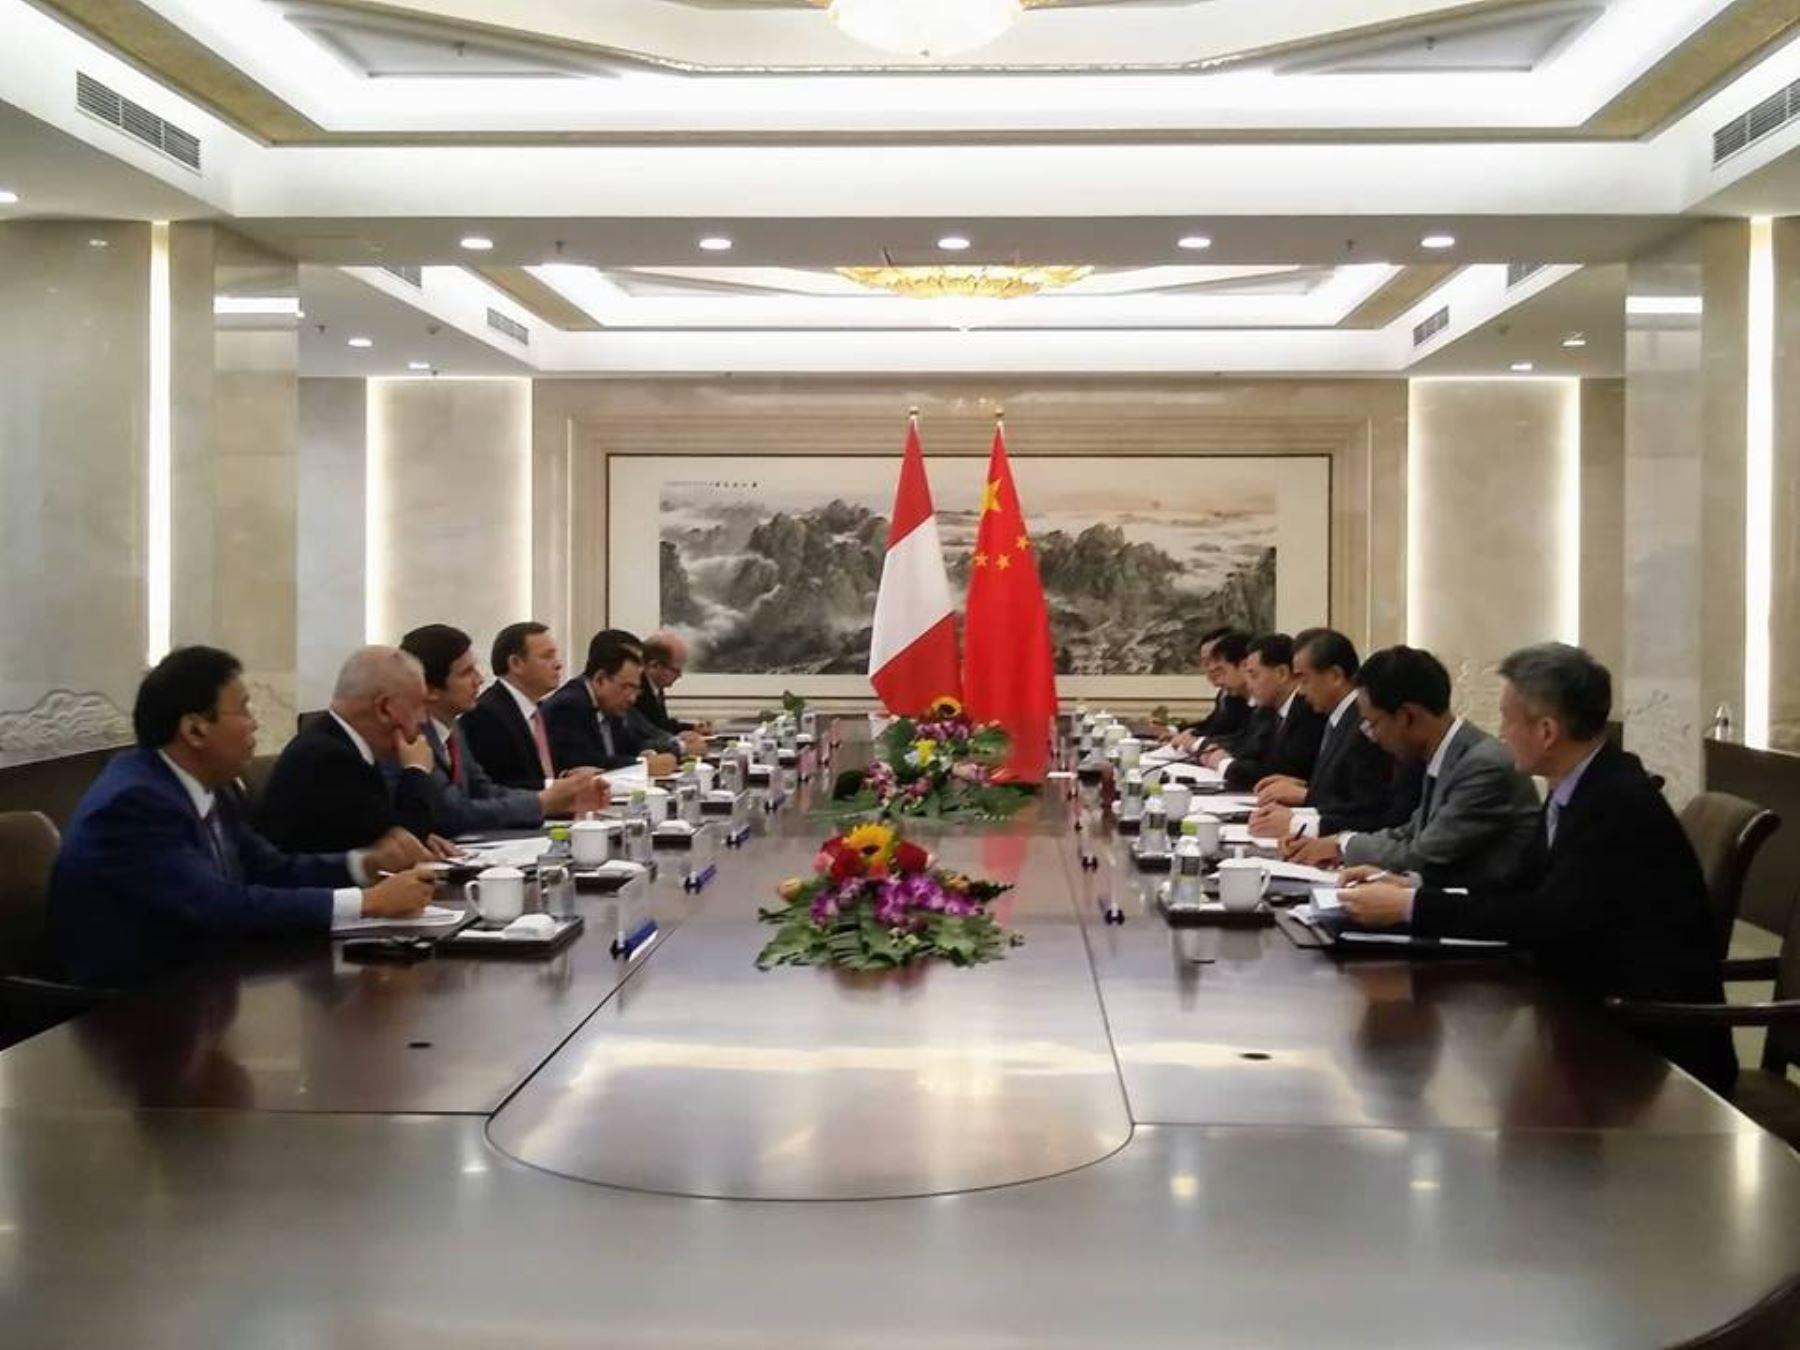 Canciller Néstor Popolizio en visita oficial a China.